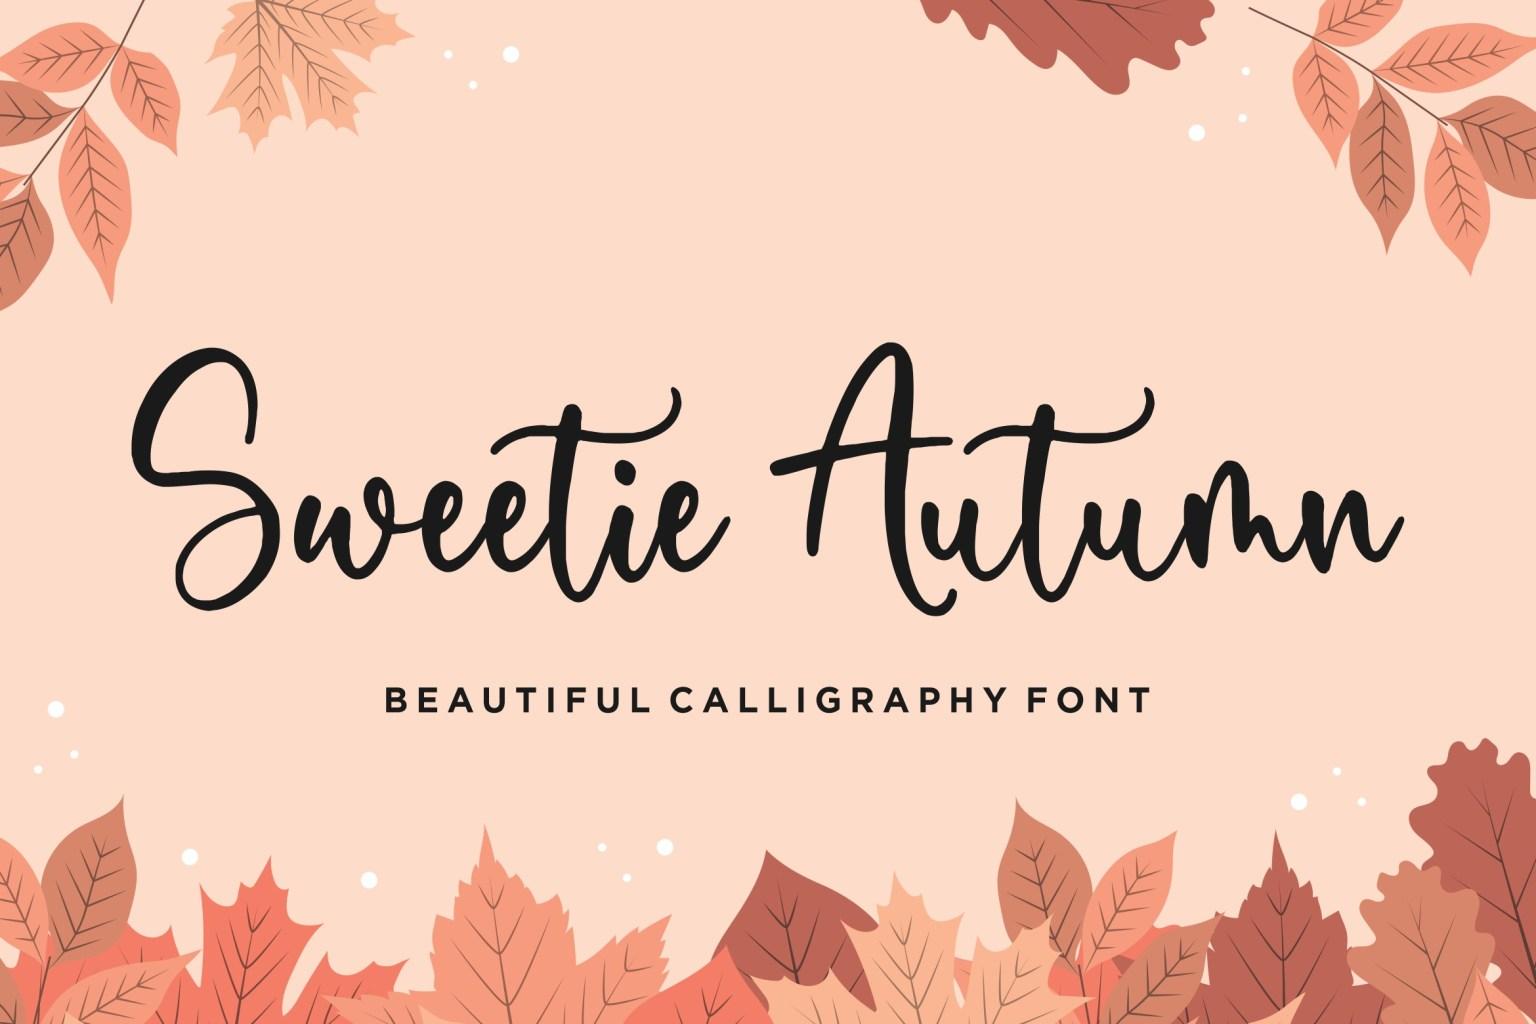 Sweetie Autumn Calligraphy Font